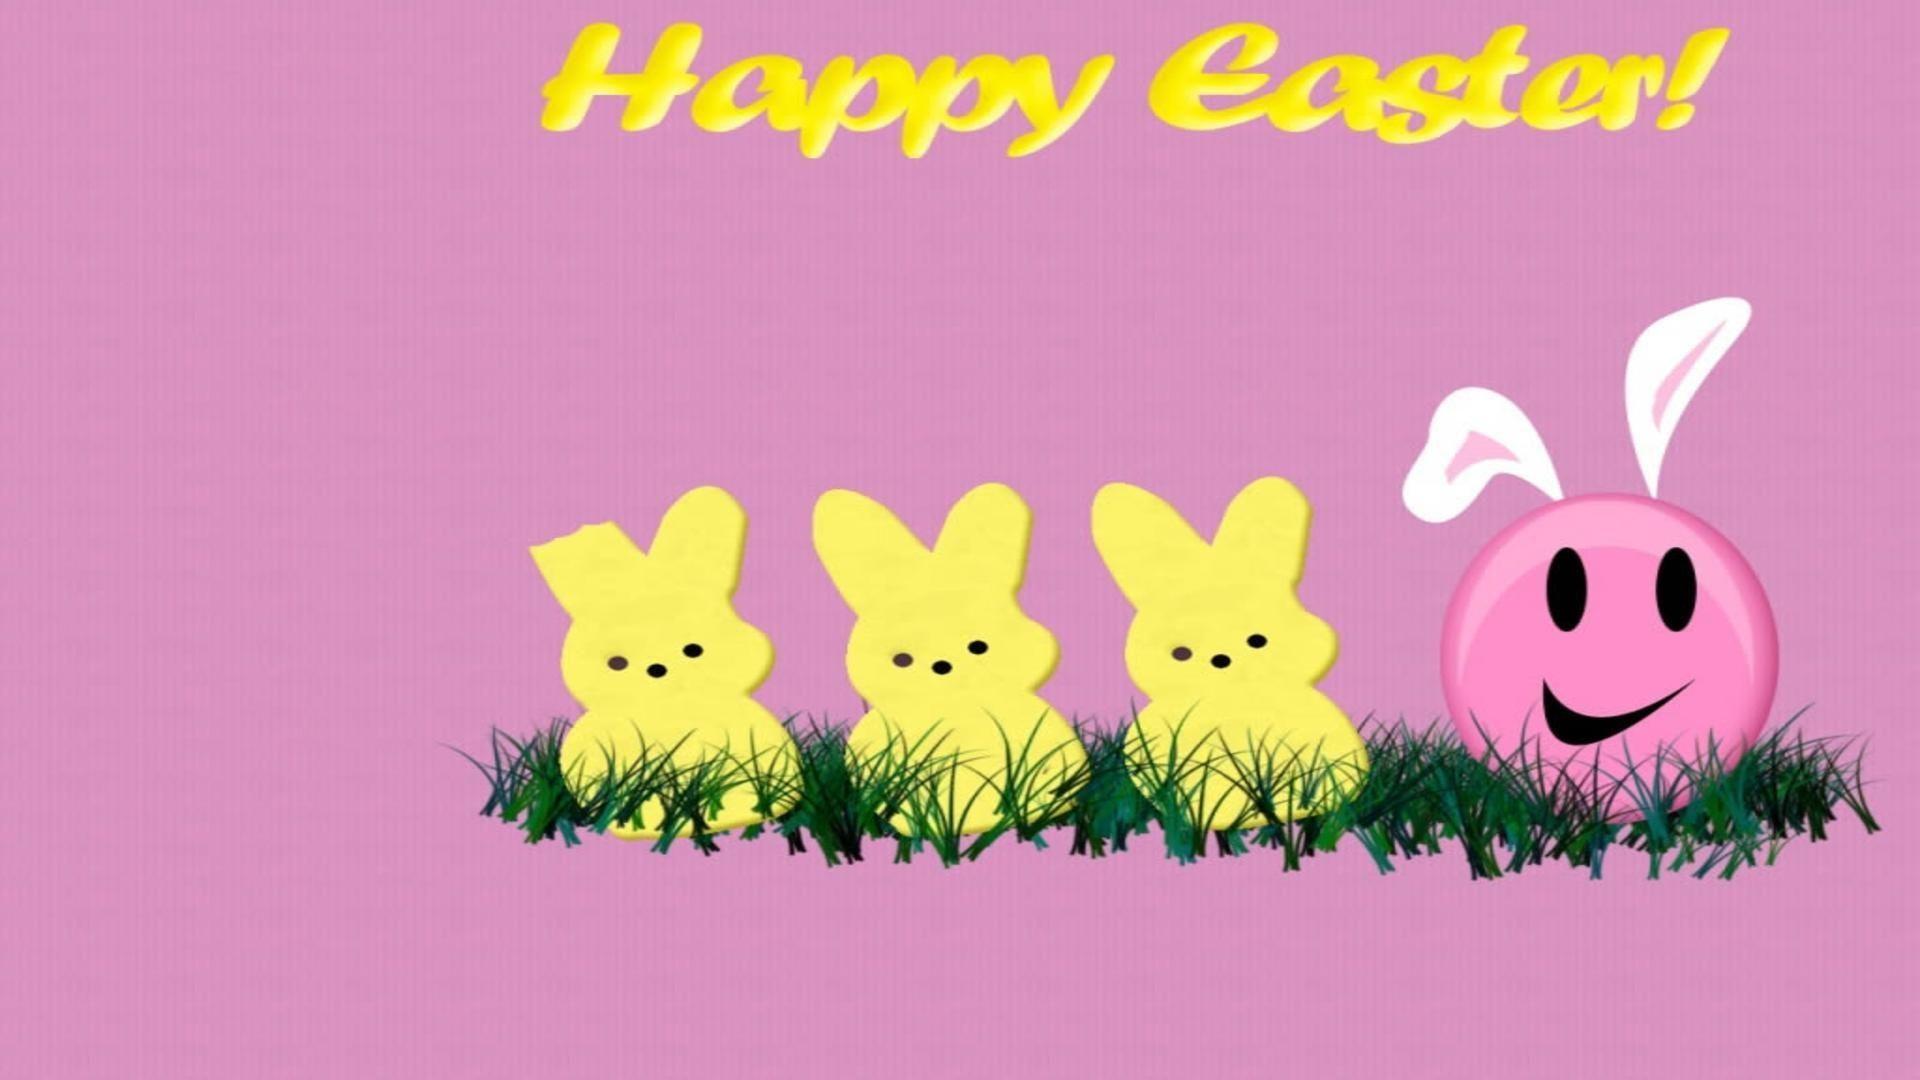 Happy easter pink theme free desktop background – free wallpaper image